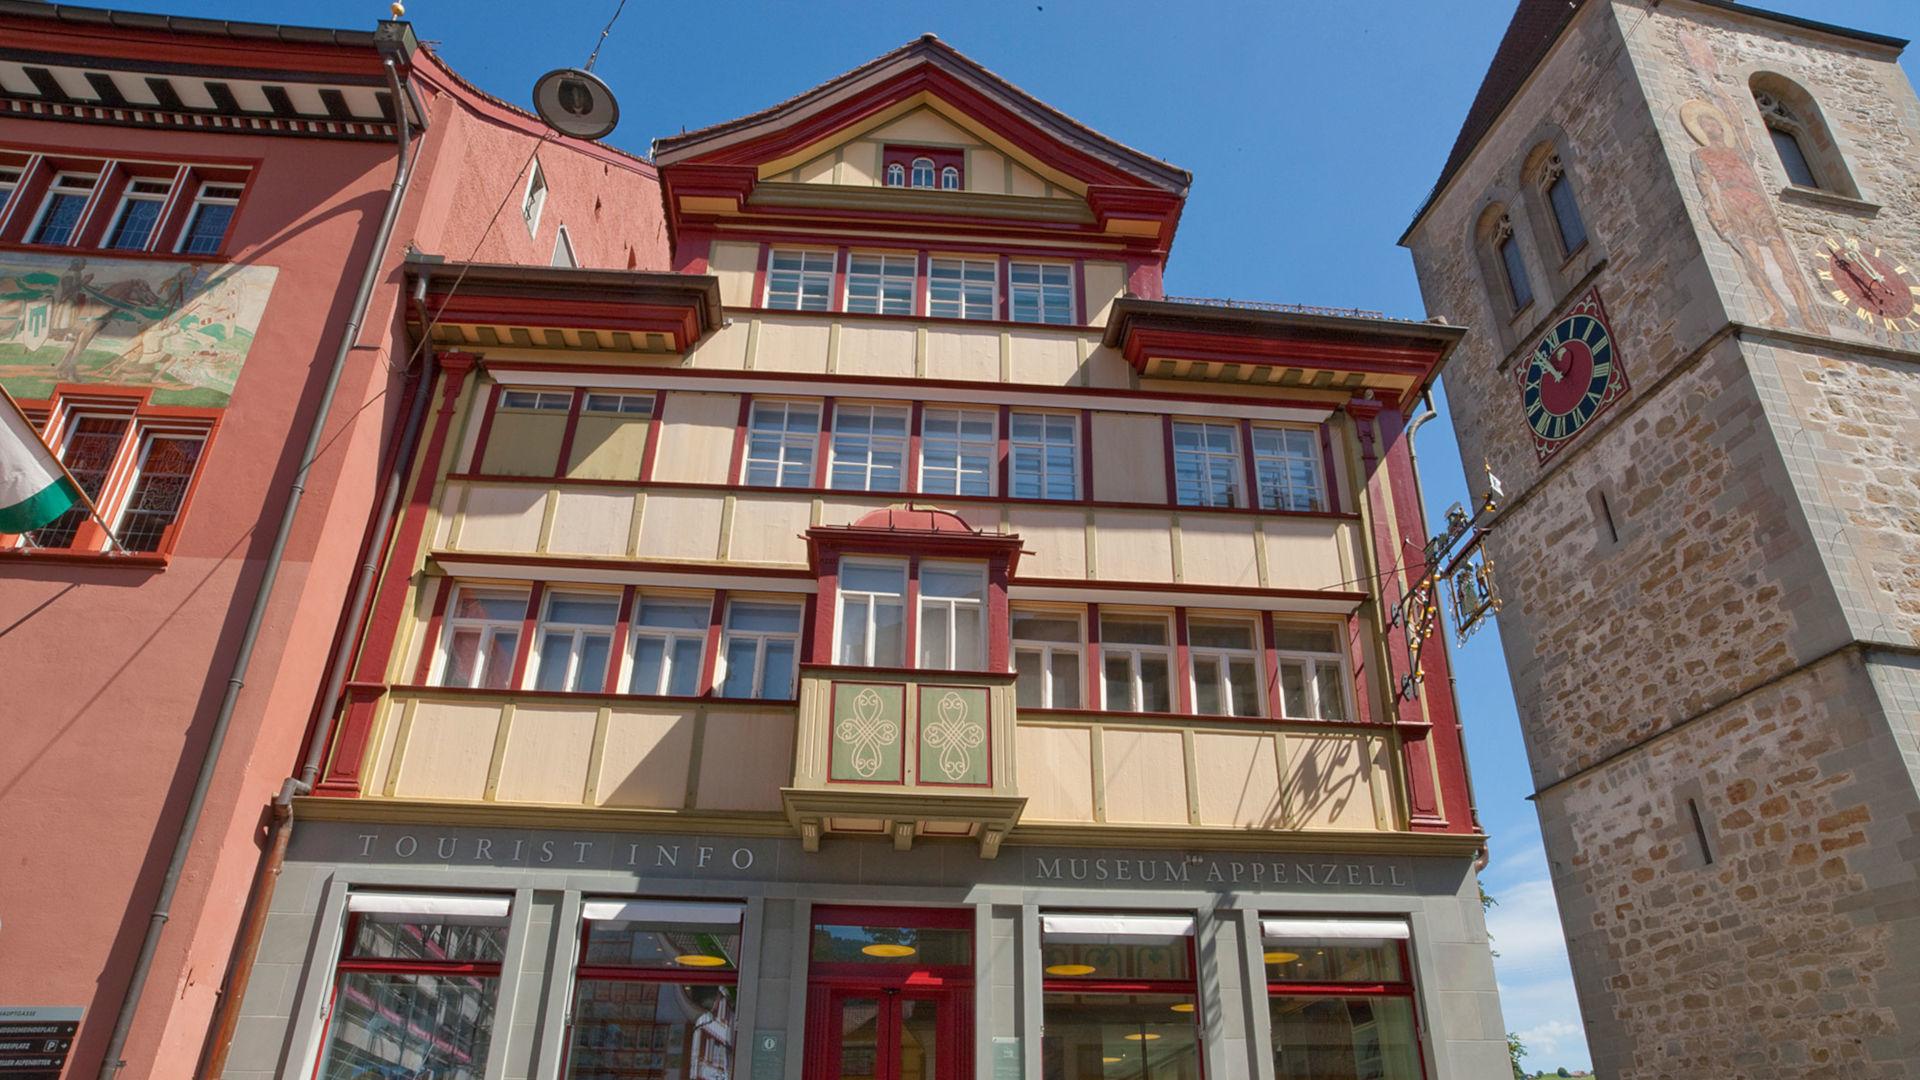 Appenzell, Museum Appenzell